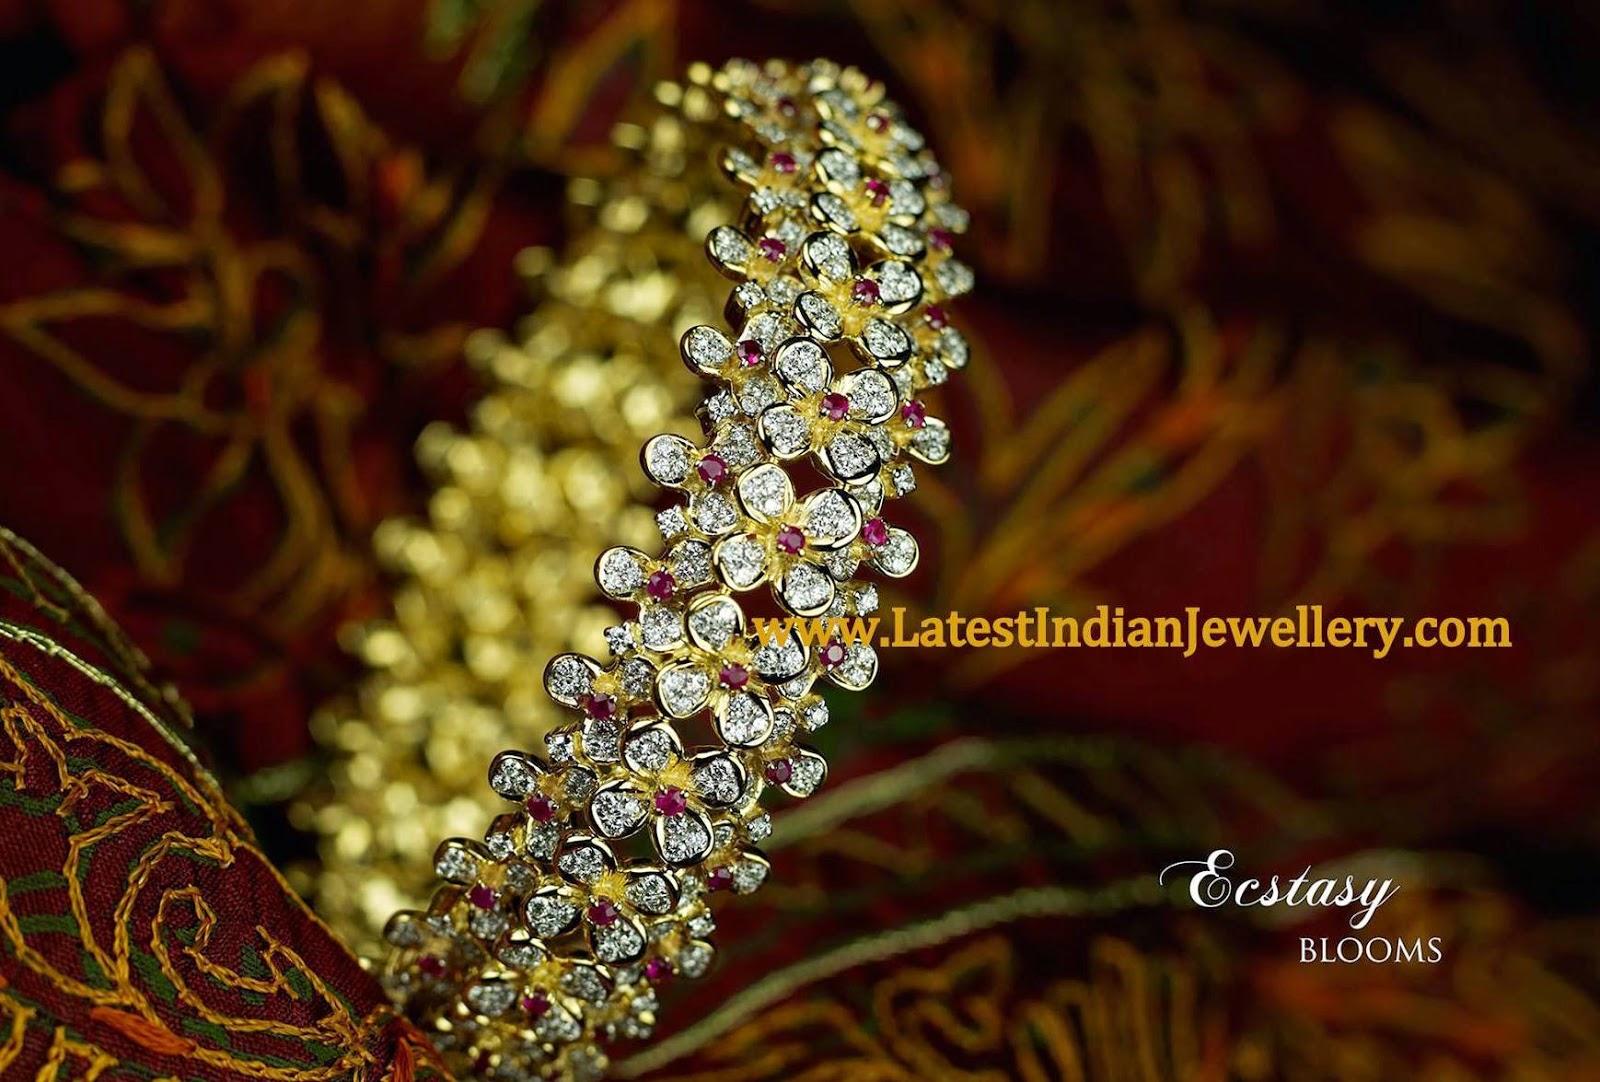 Single Floral Broad Diamond Bangle